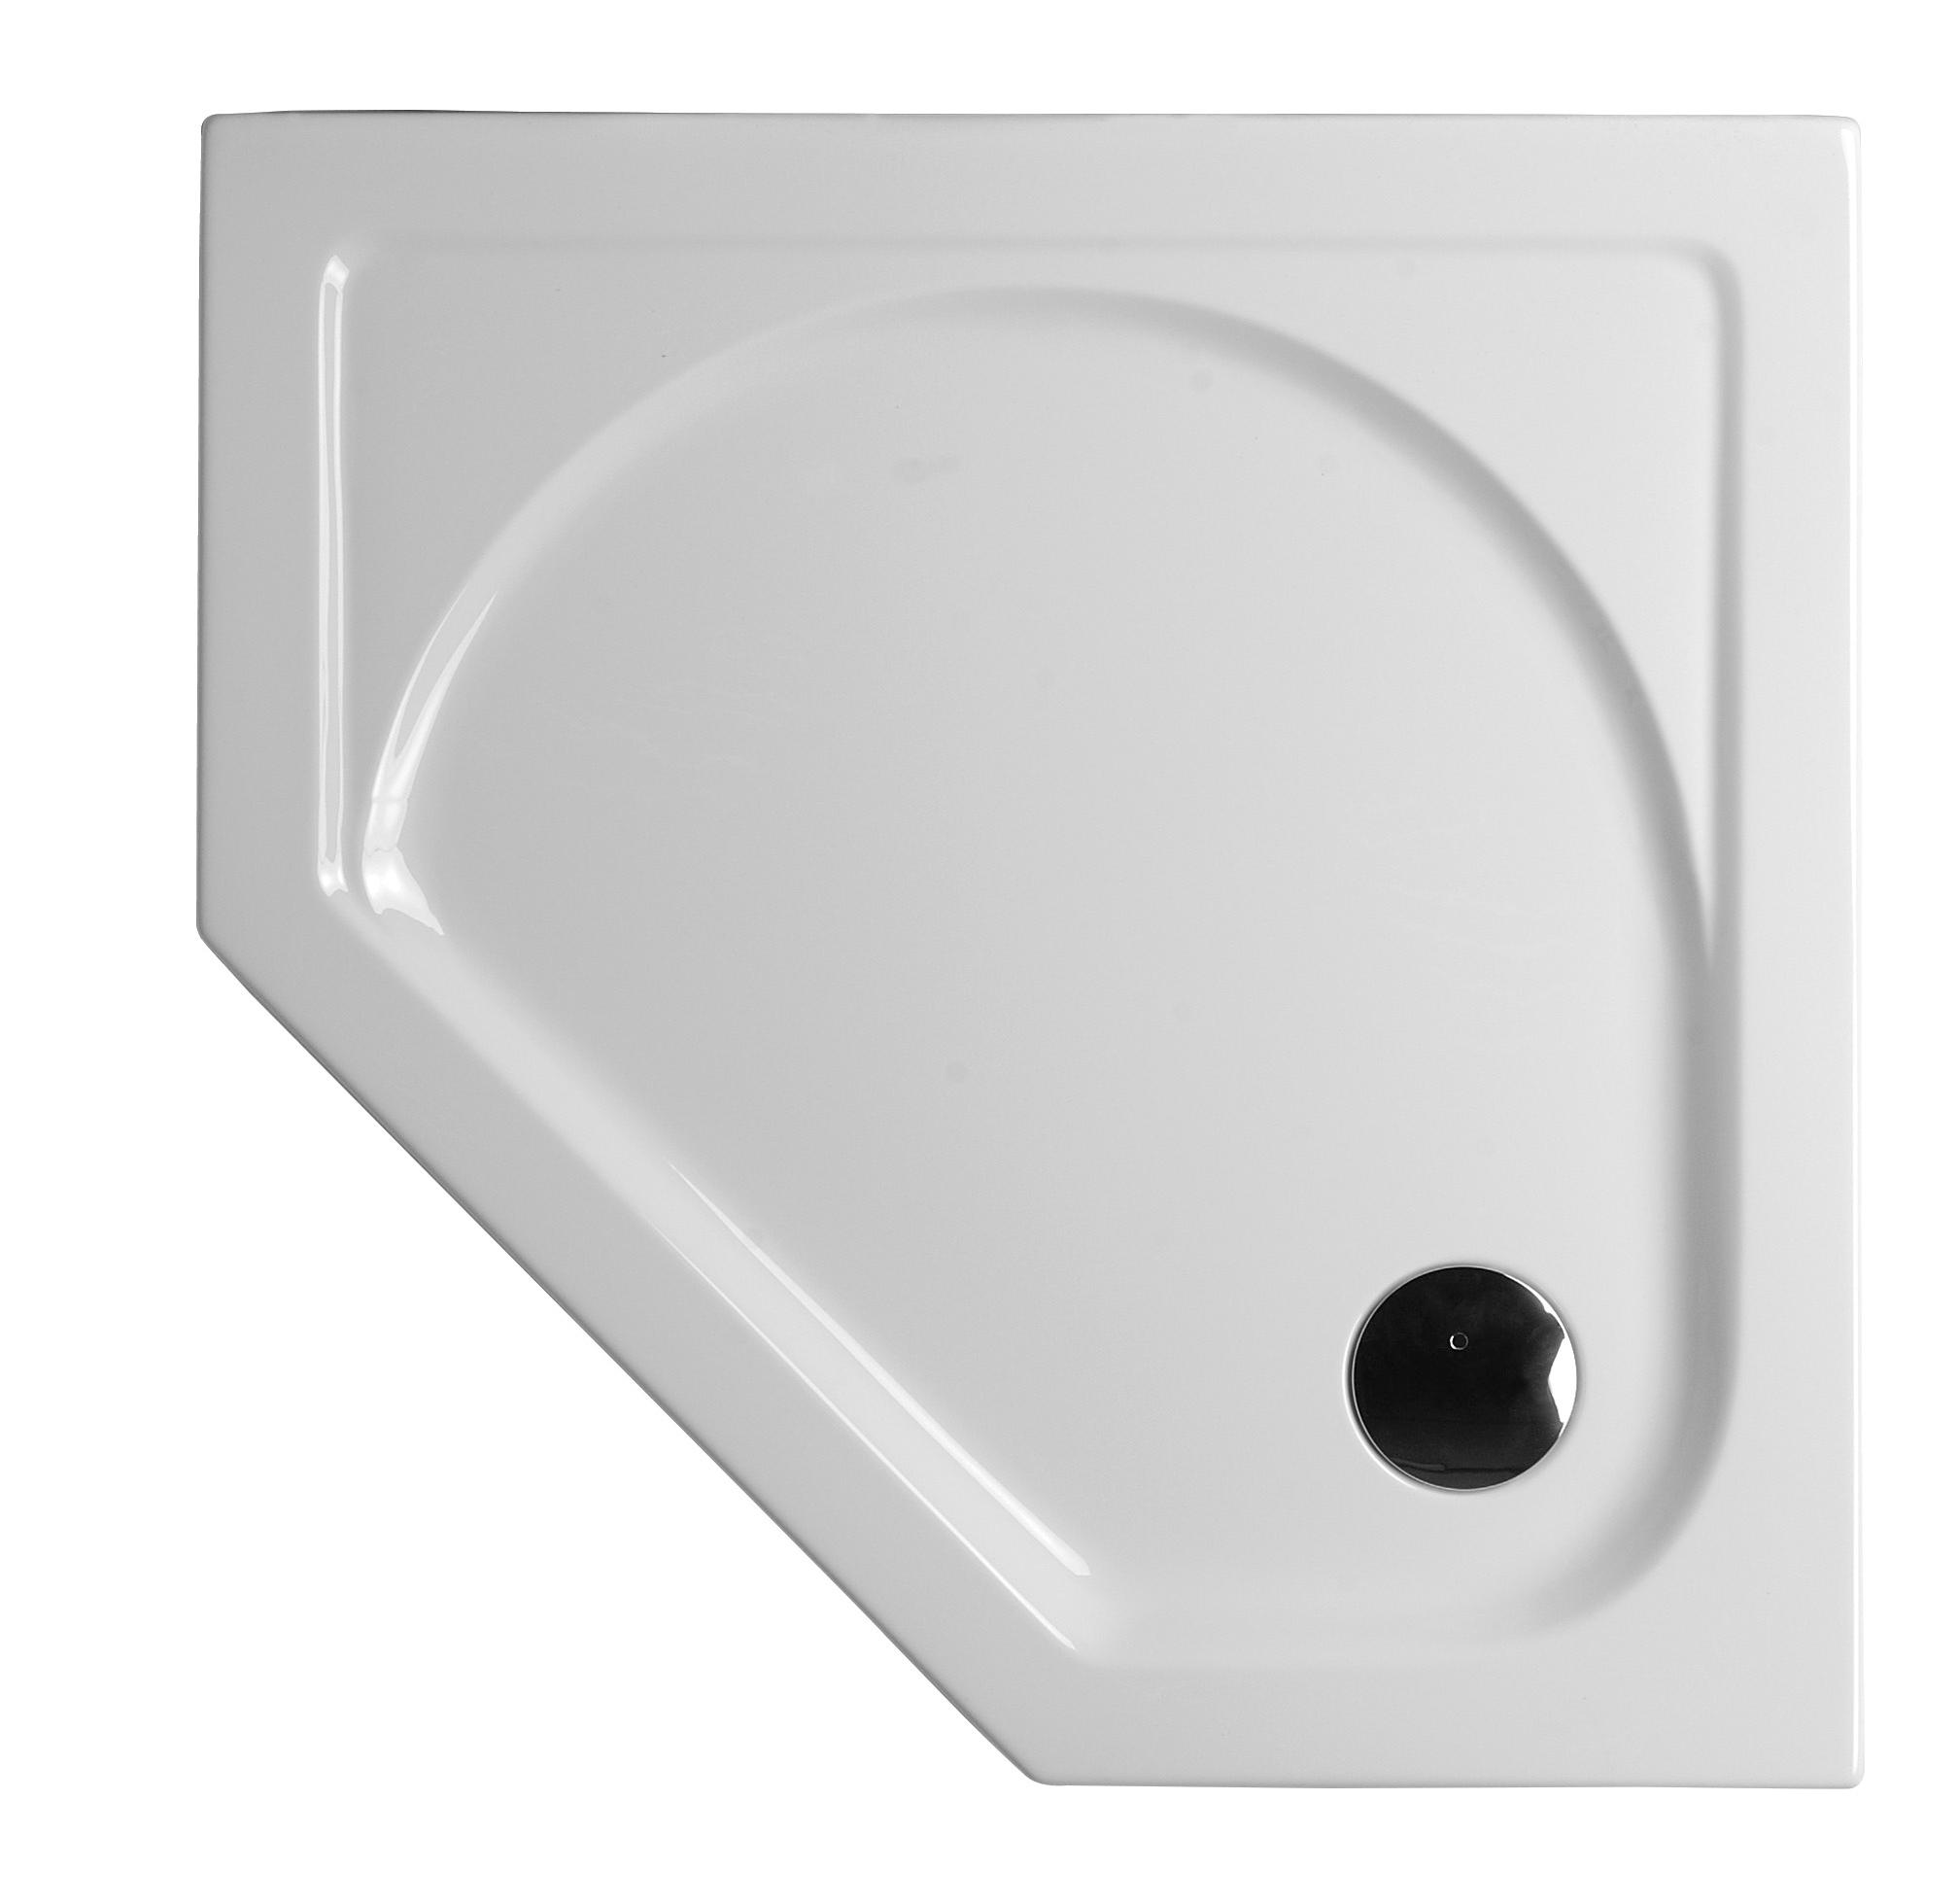 Integra receveur ultra plat en acrylique, pentagonal, 100  x  100 cm, VitrA Antislip